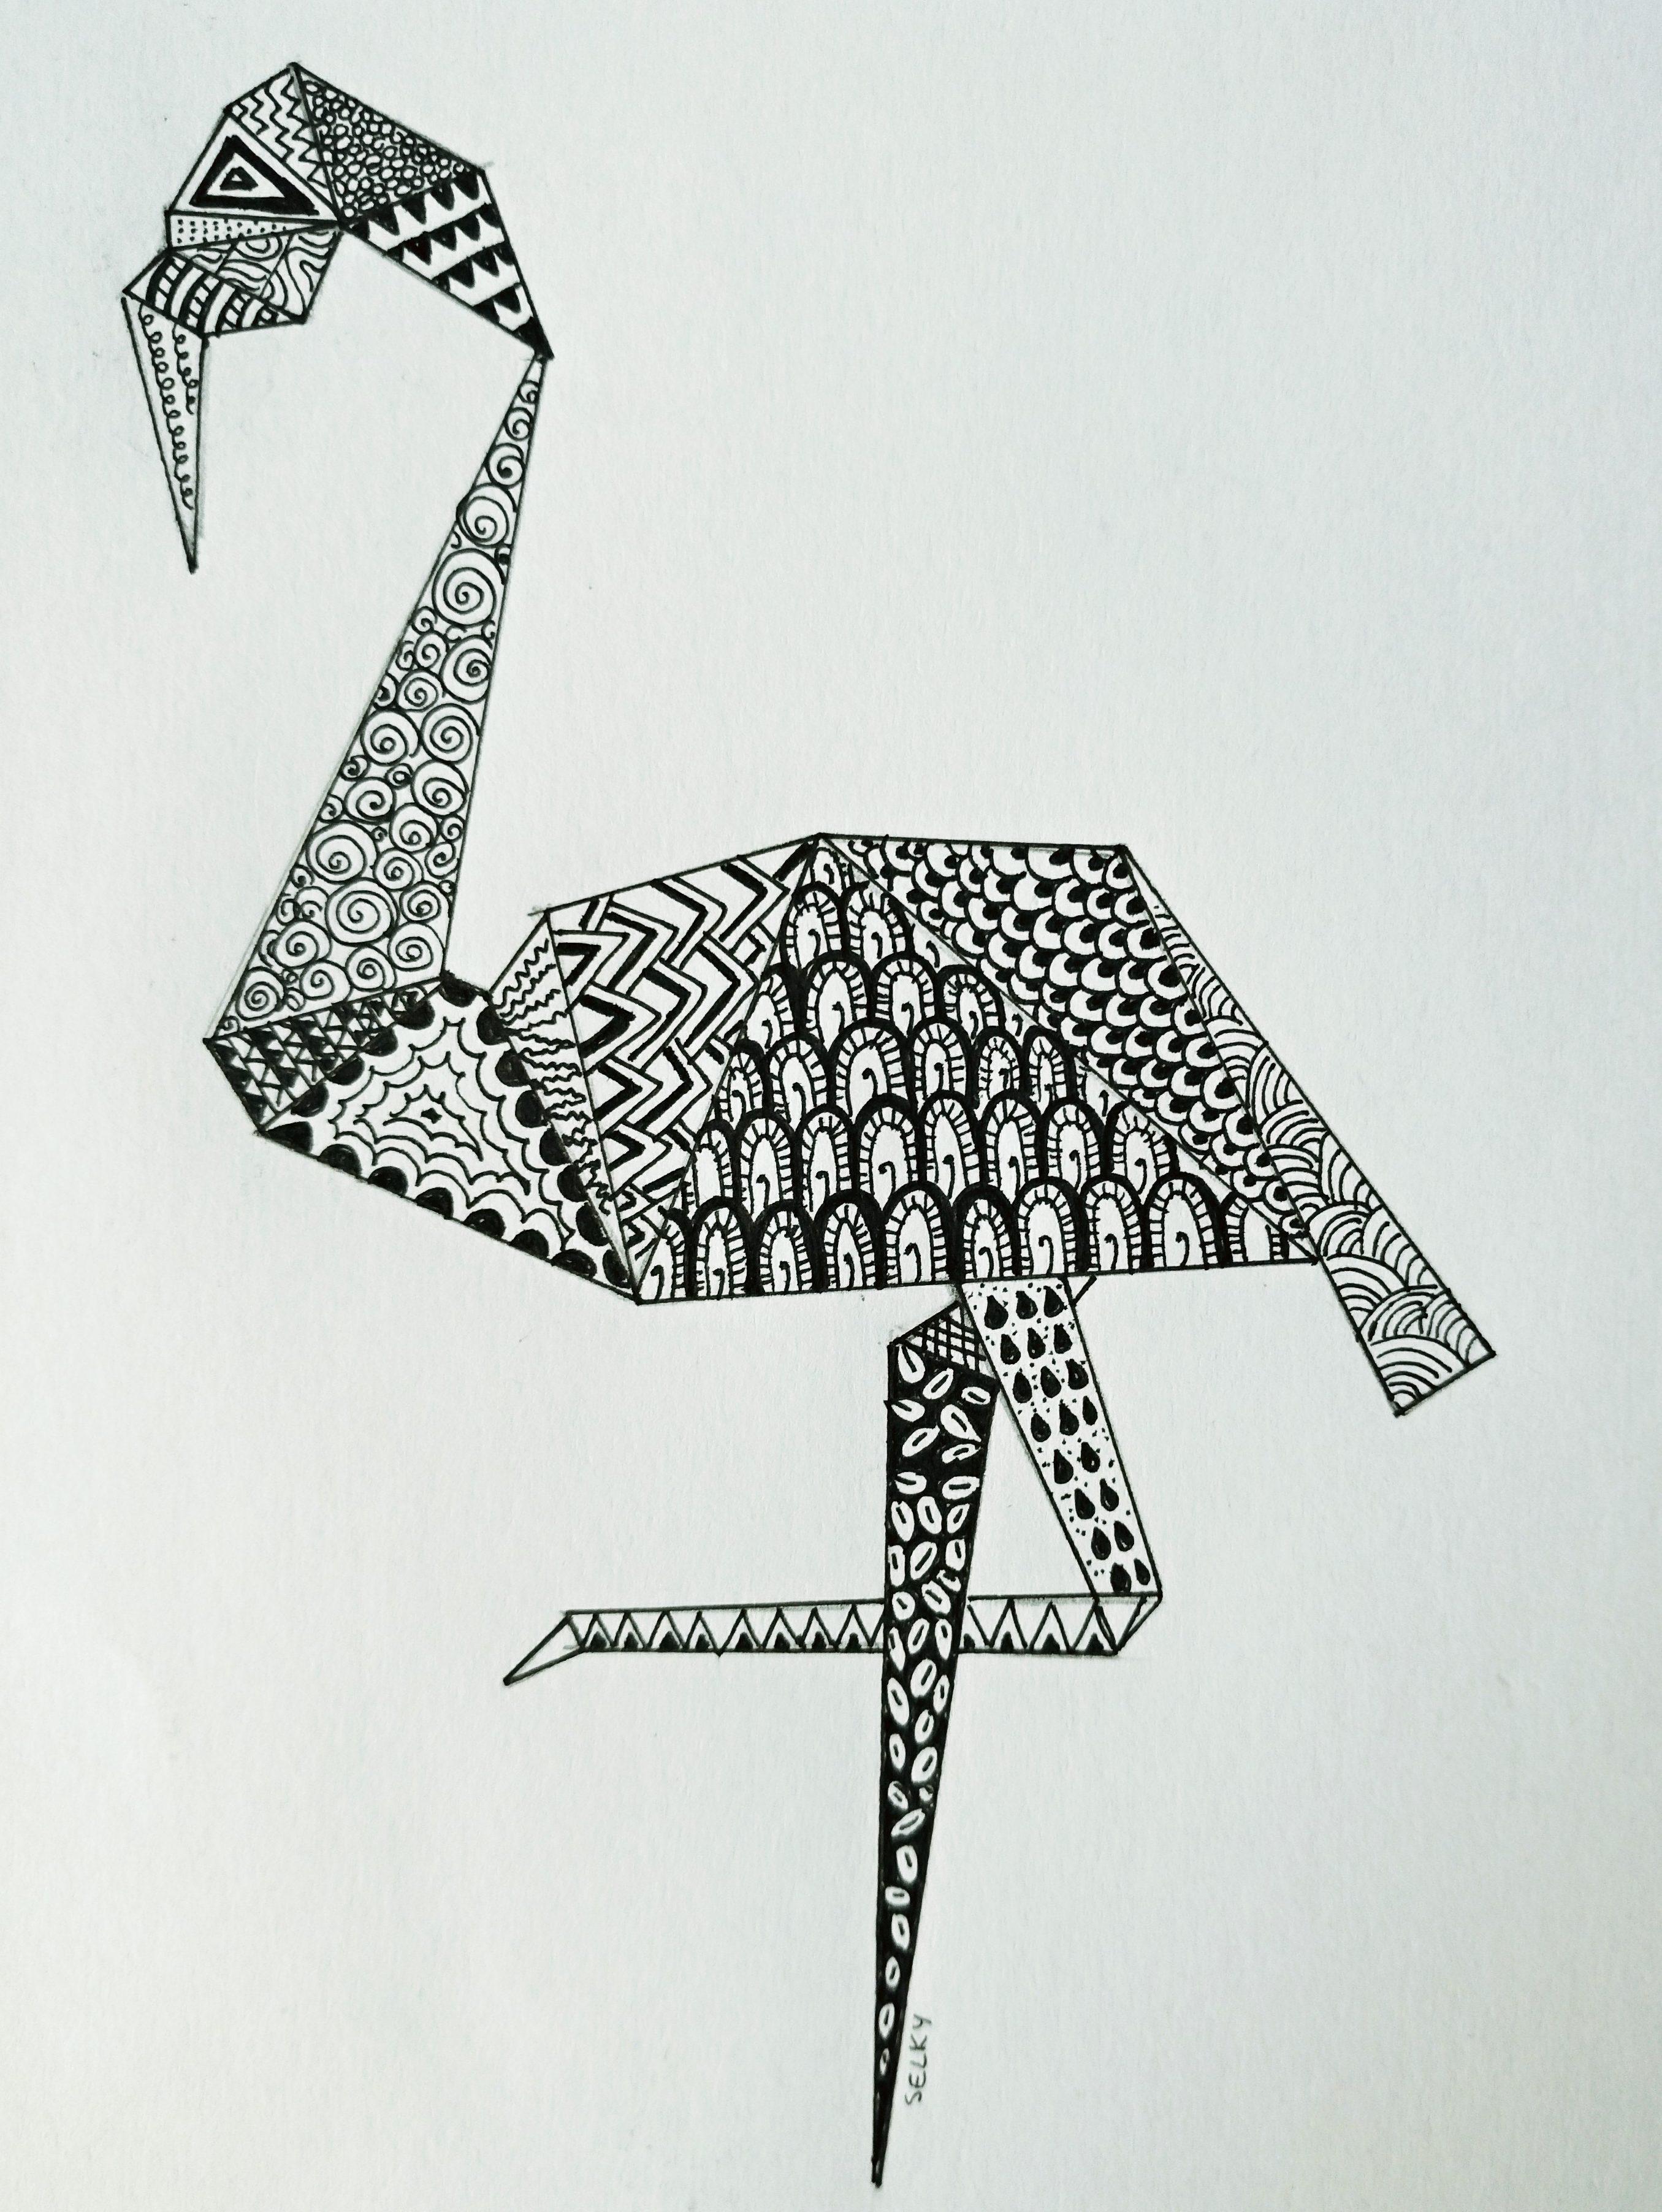 dessin méditatif zen doodle b